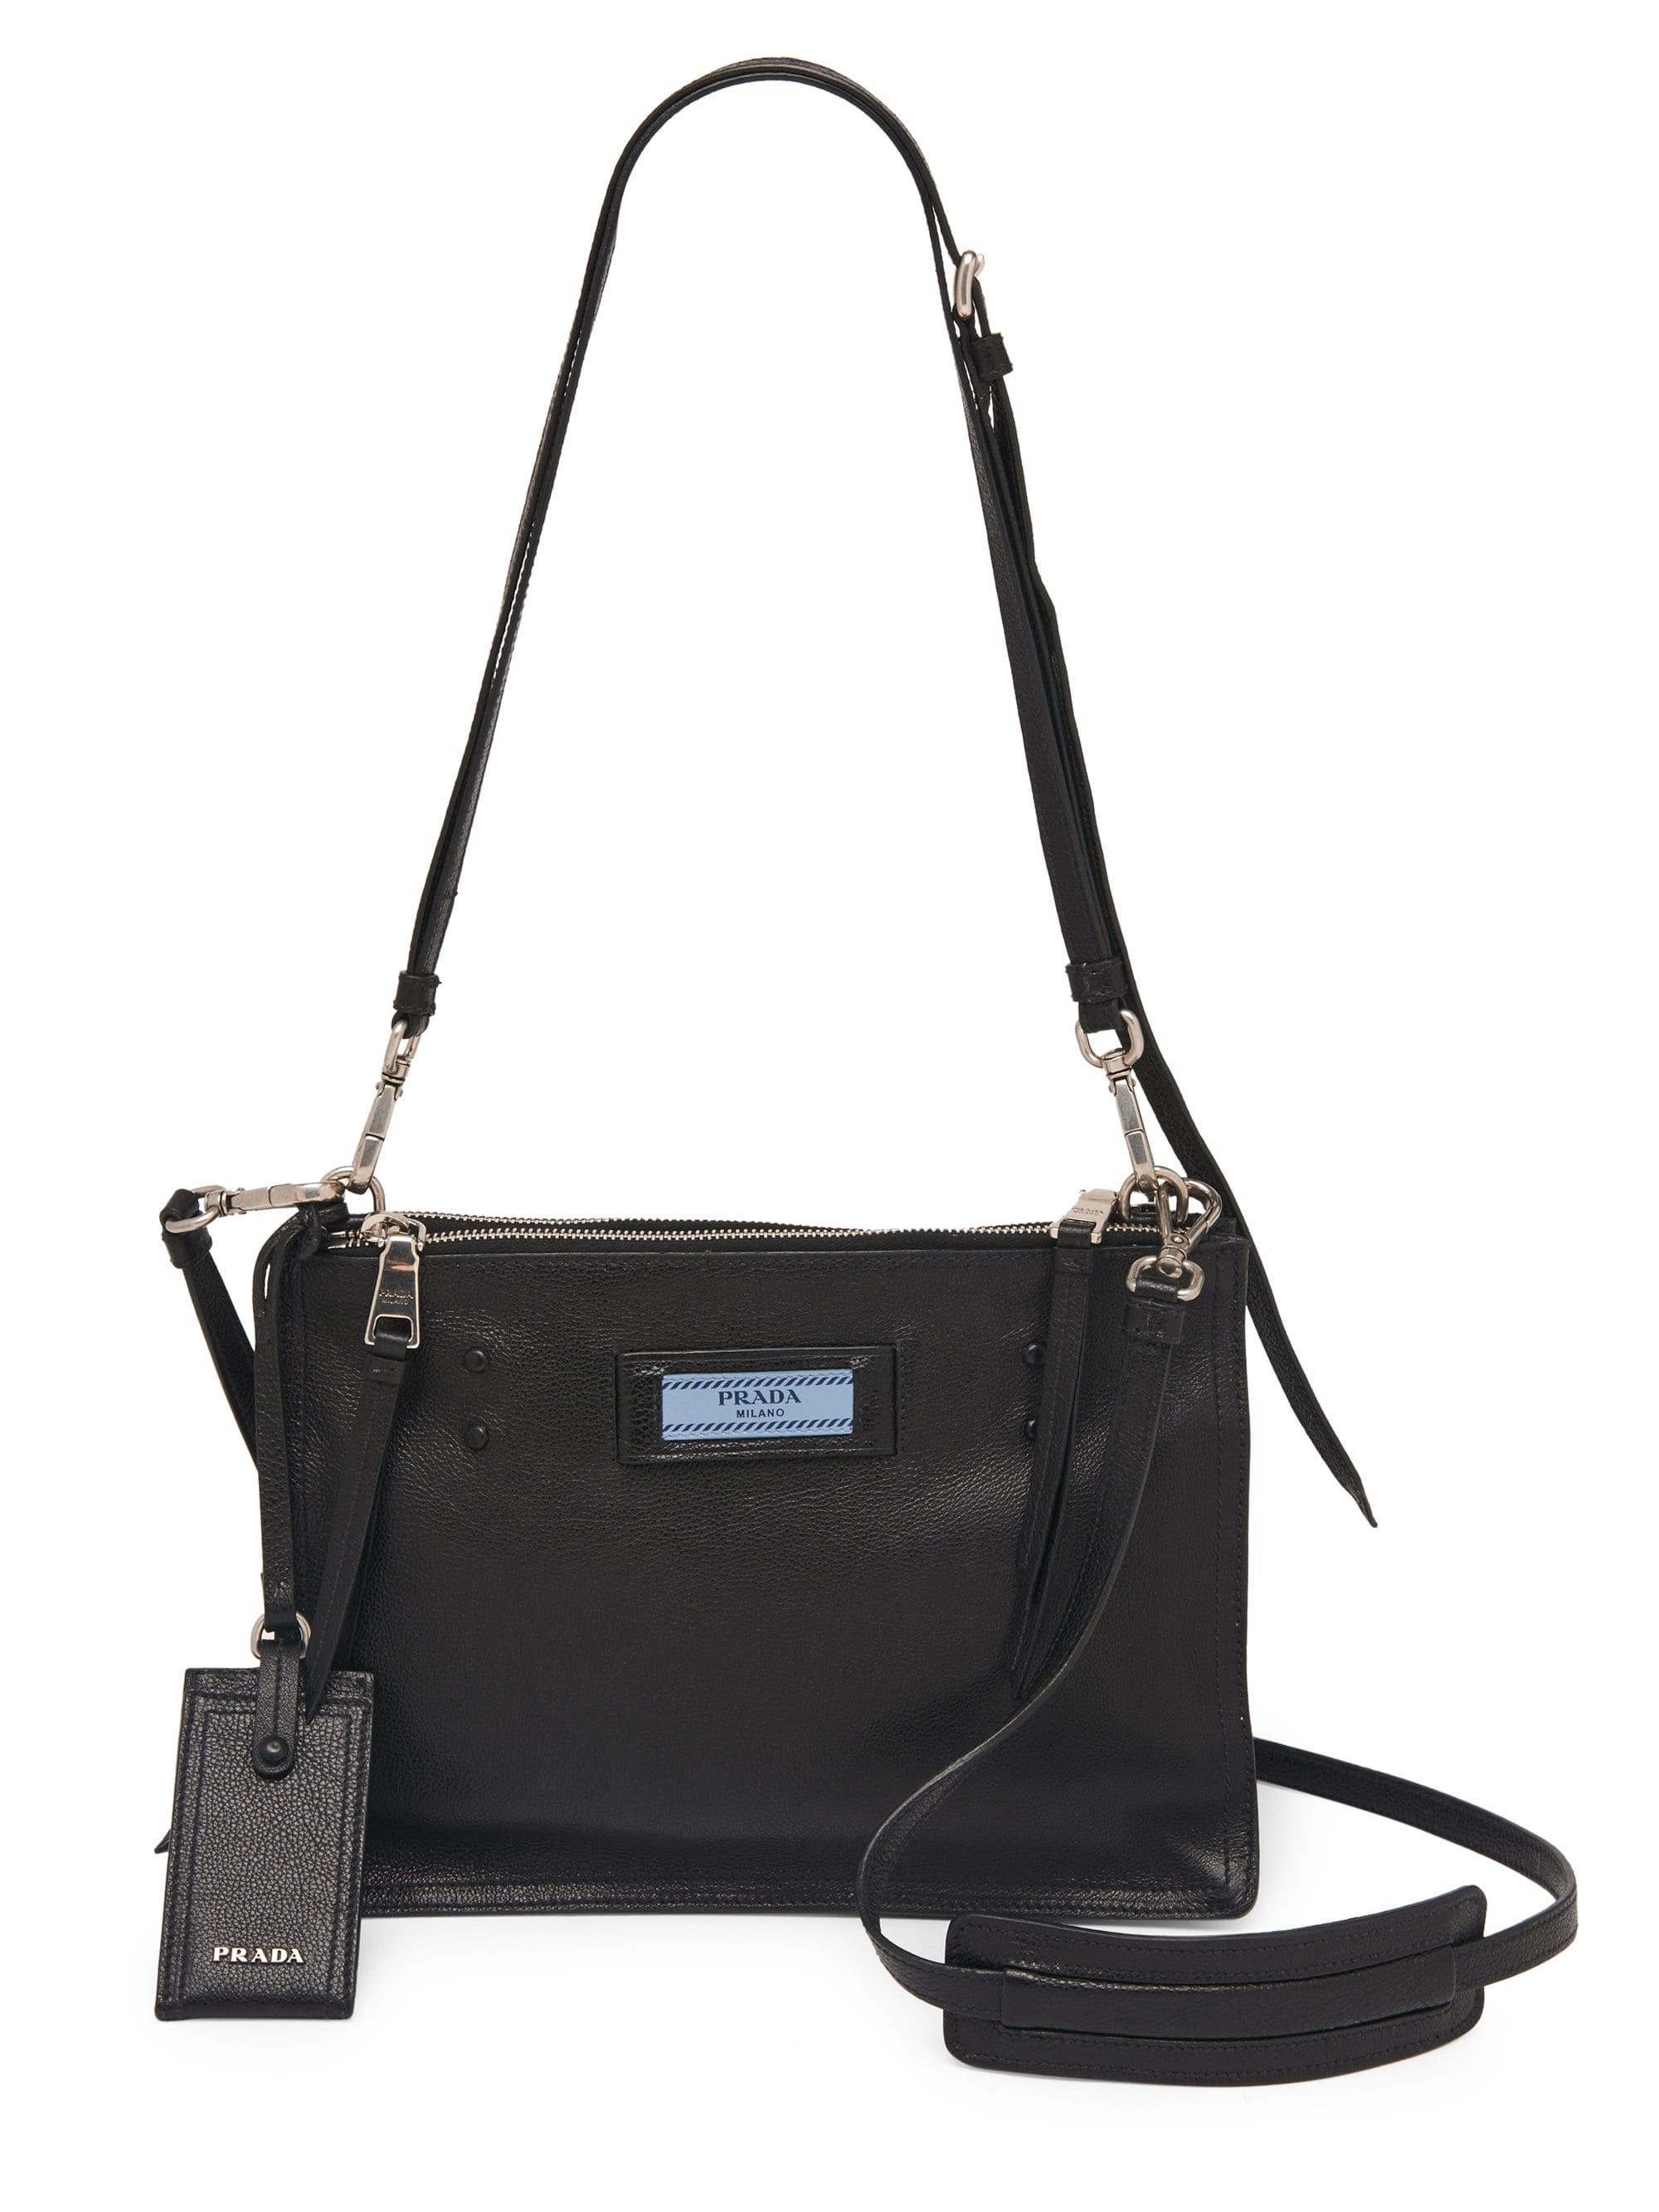 23b8bedf7c3b View Black Prada Bag Lyst Fullscreen Crossbody Etiquette 4nqwvX